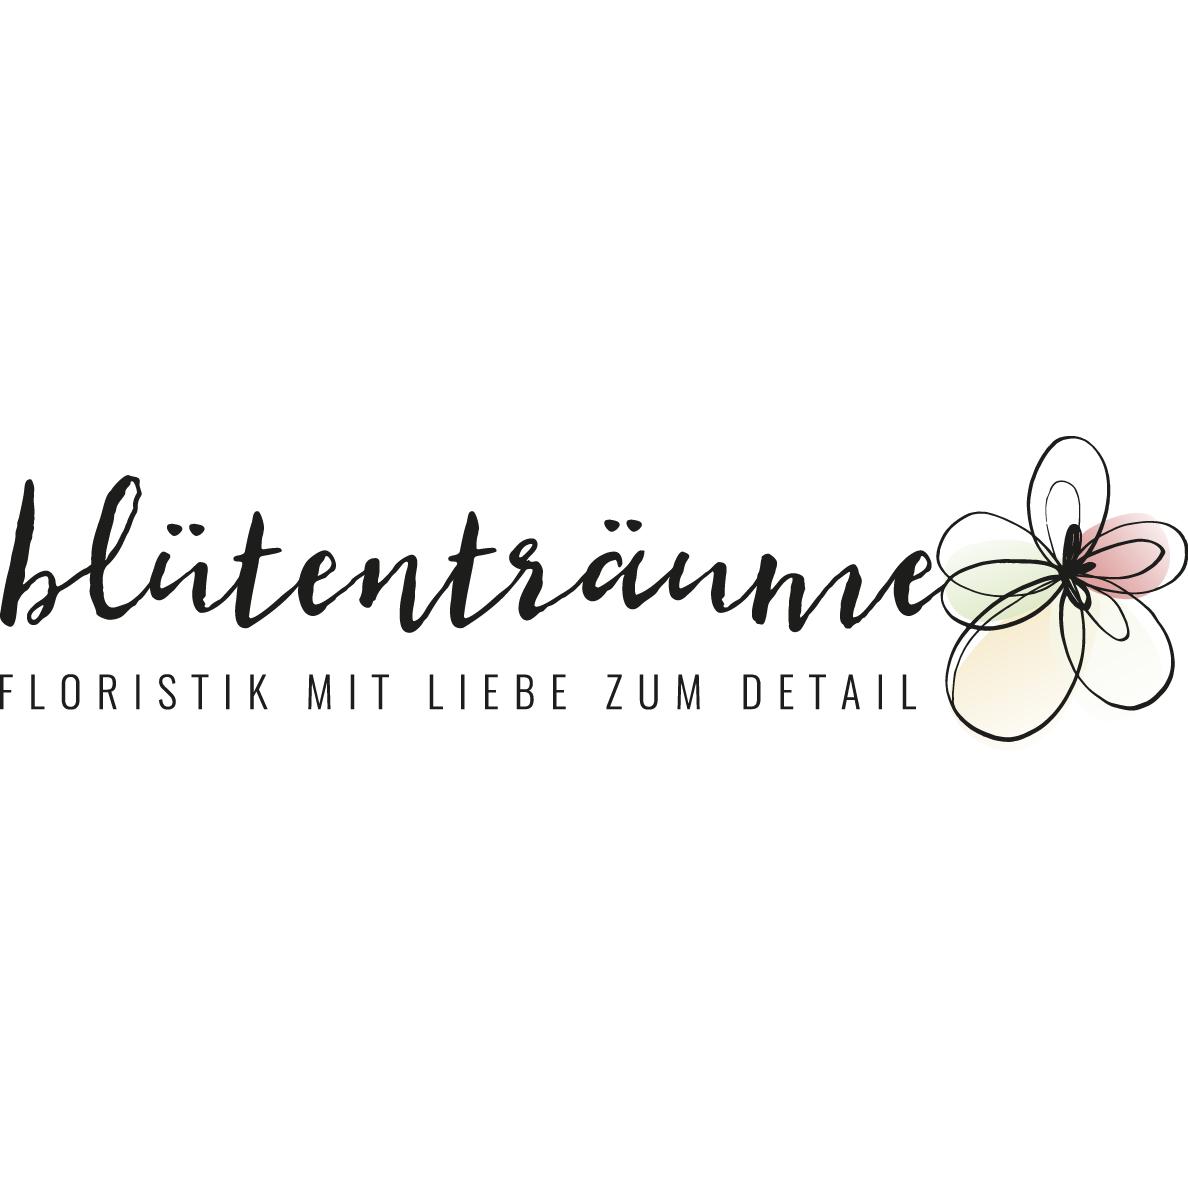 Blütenträume - Floristik mit Liebe zum Detail